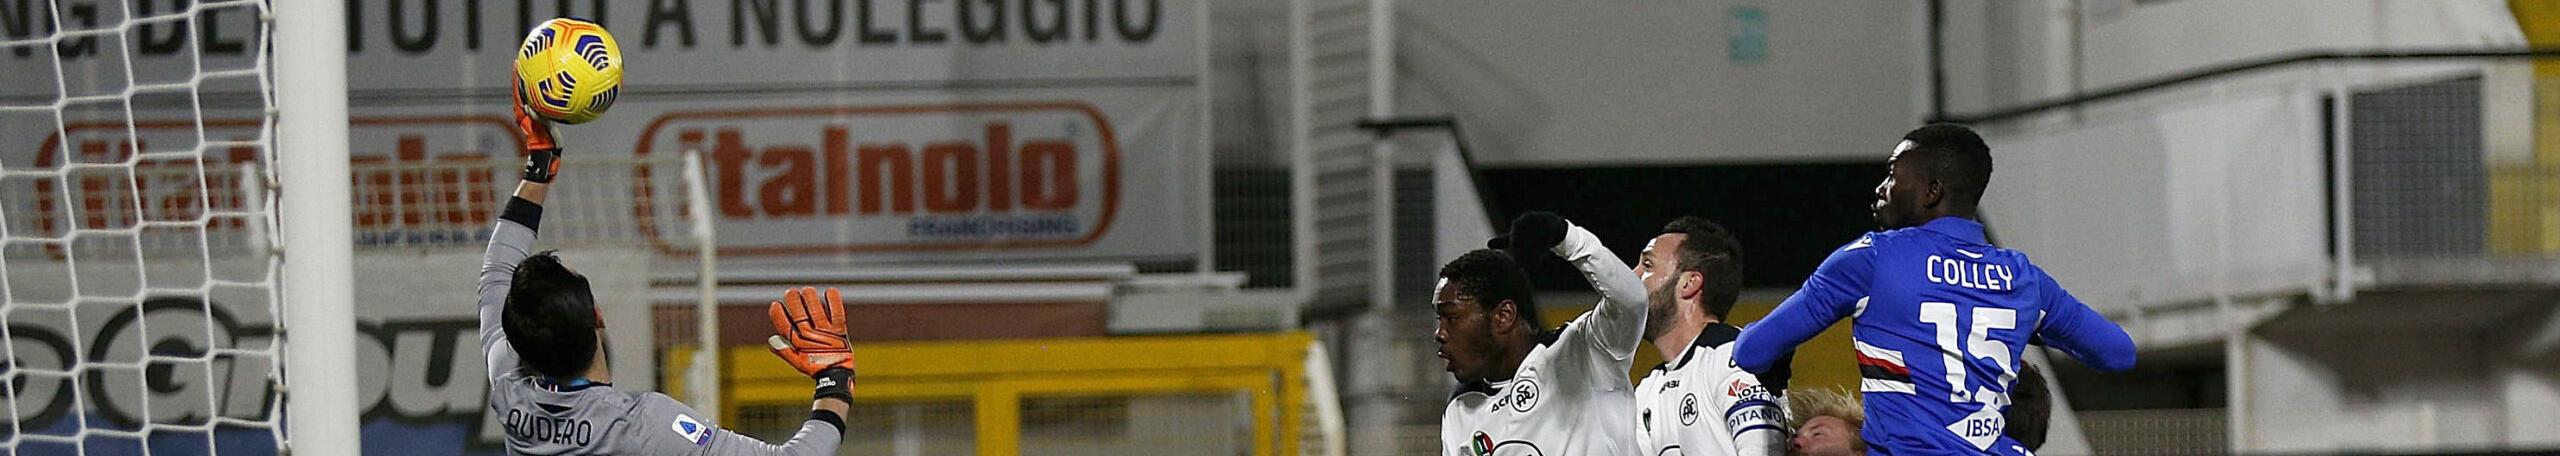 Sampdoria-Spezia, Aquilotti a caccia di punti-salvezza nel derby di Liguria